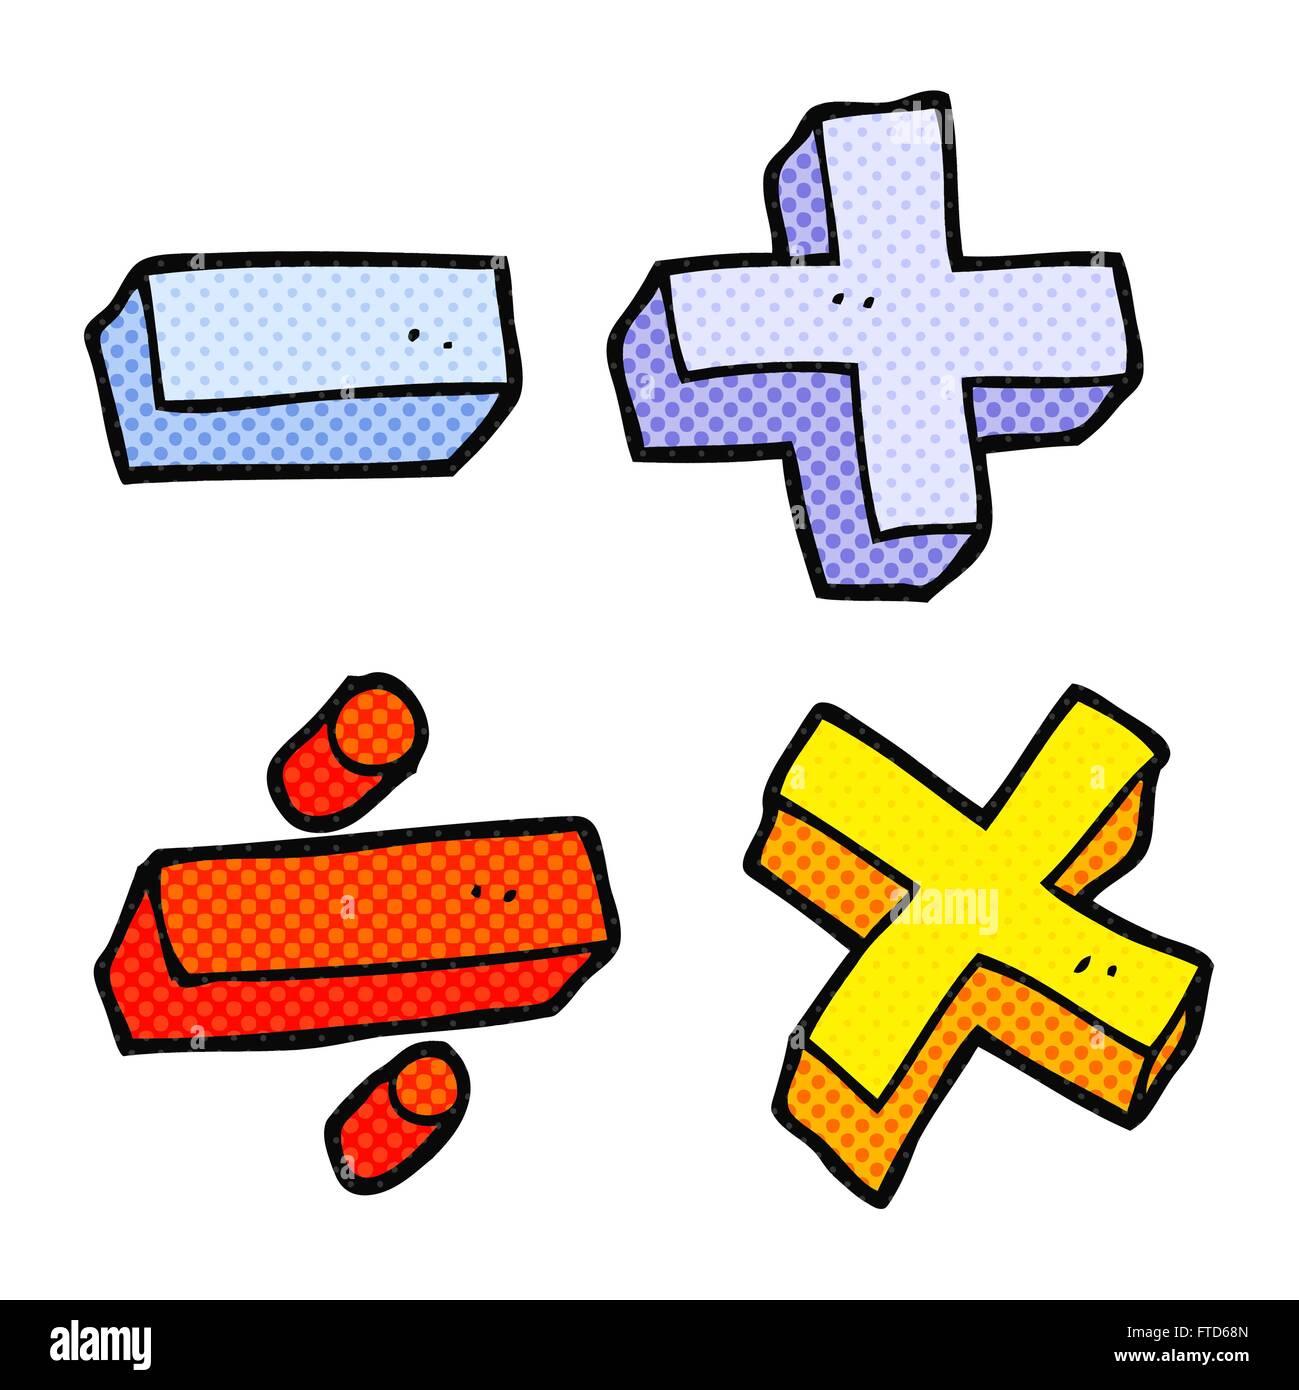 Freehand drawn cartoon math symbols stock vector art illustration freehand drawn cartoon math symbols publicscrutiny Choice Image